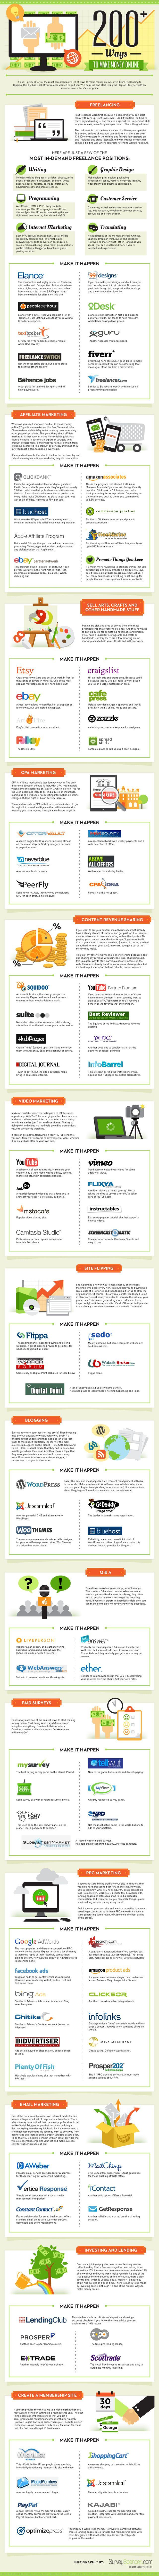 200 ways to make money online #infografia #infographic #internet